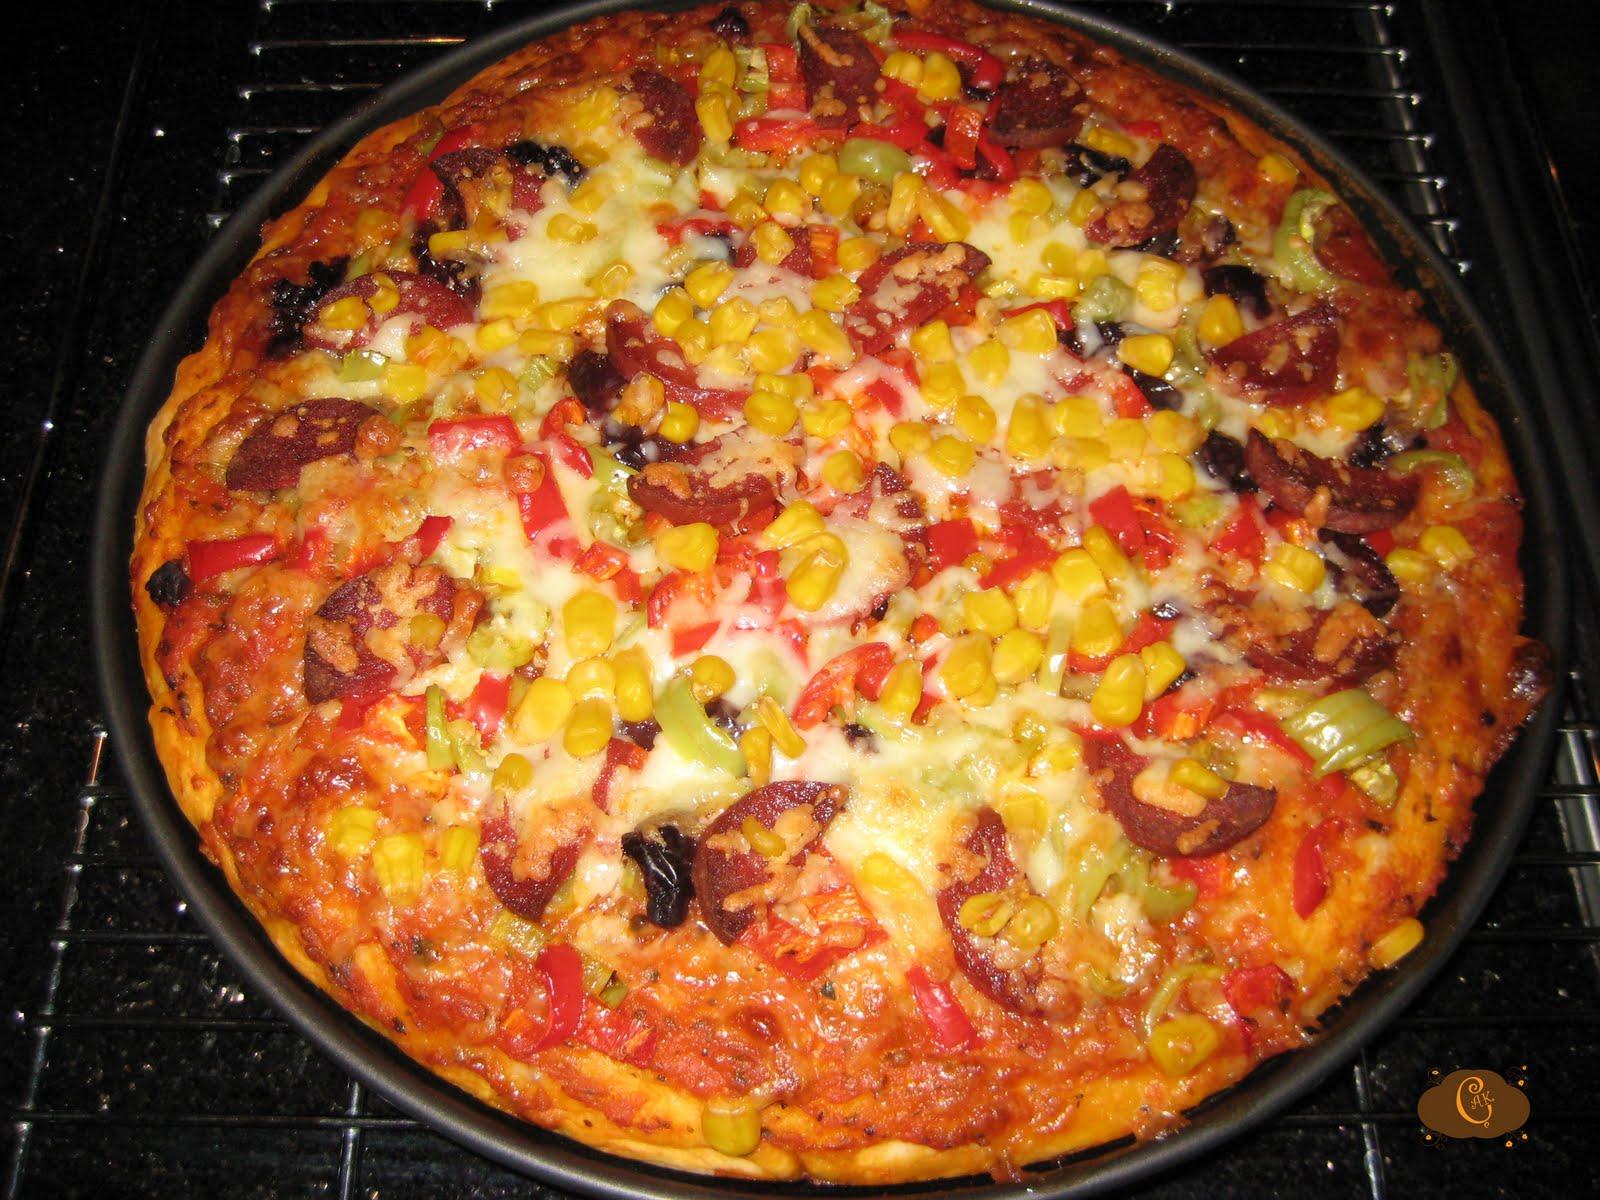 Kolay pizza tarifi pratik resimli